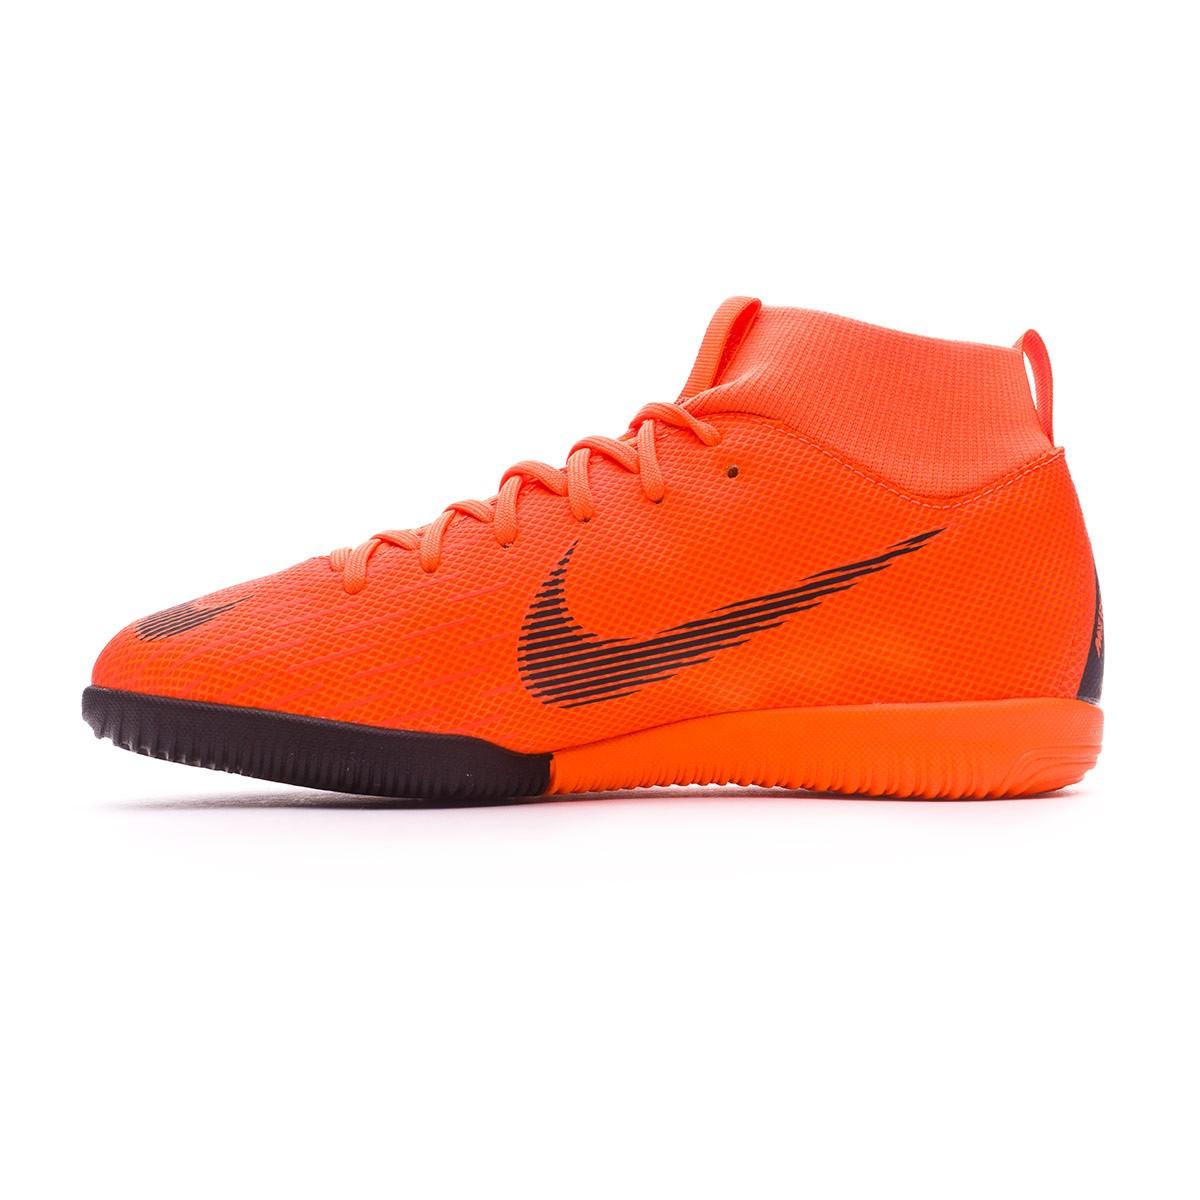 118374ac8799 Futsal Boot Nike Kids Mercurial SuperflyX VI Academy GS IC Total orange-Black-Volt  - Tienda de fútbol Fútbol Emotion